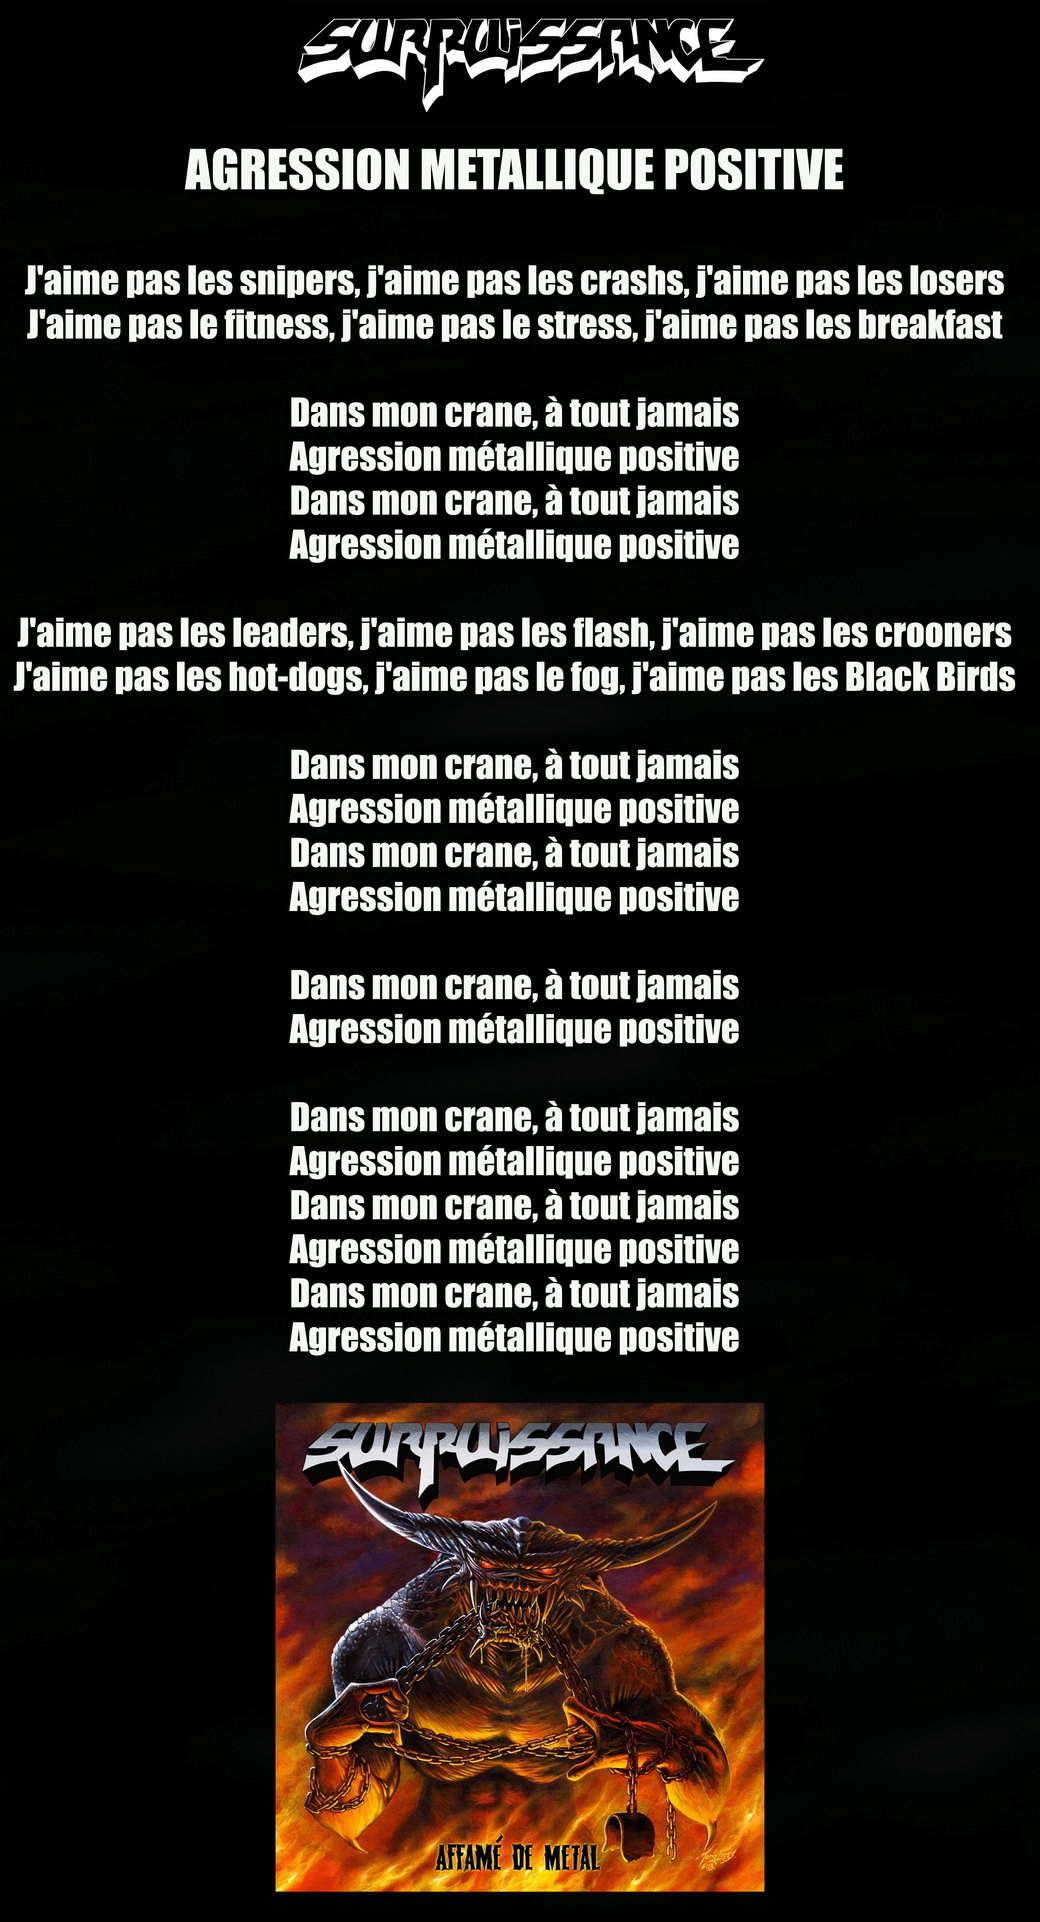 SURPUISSANCE Agression Metallique Positive (2014) Surpui10